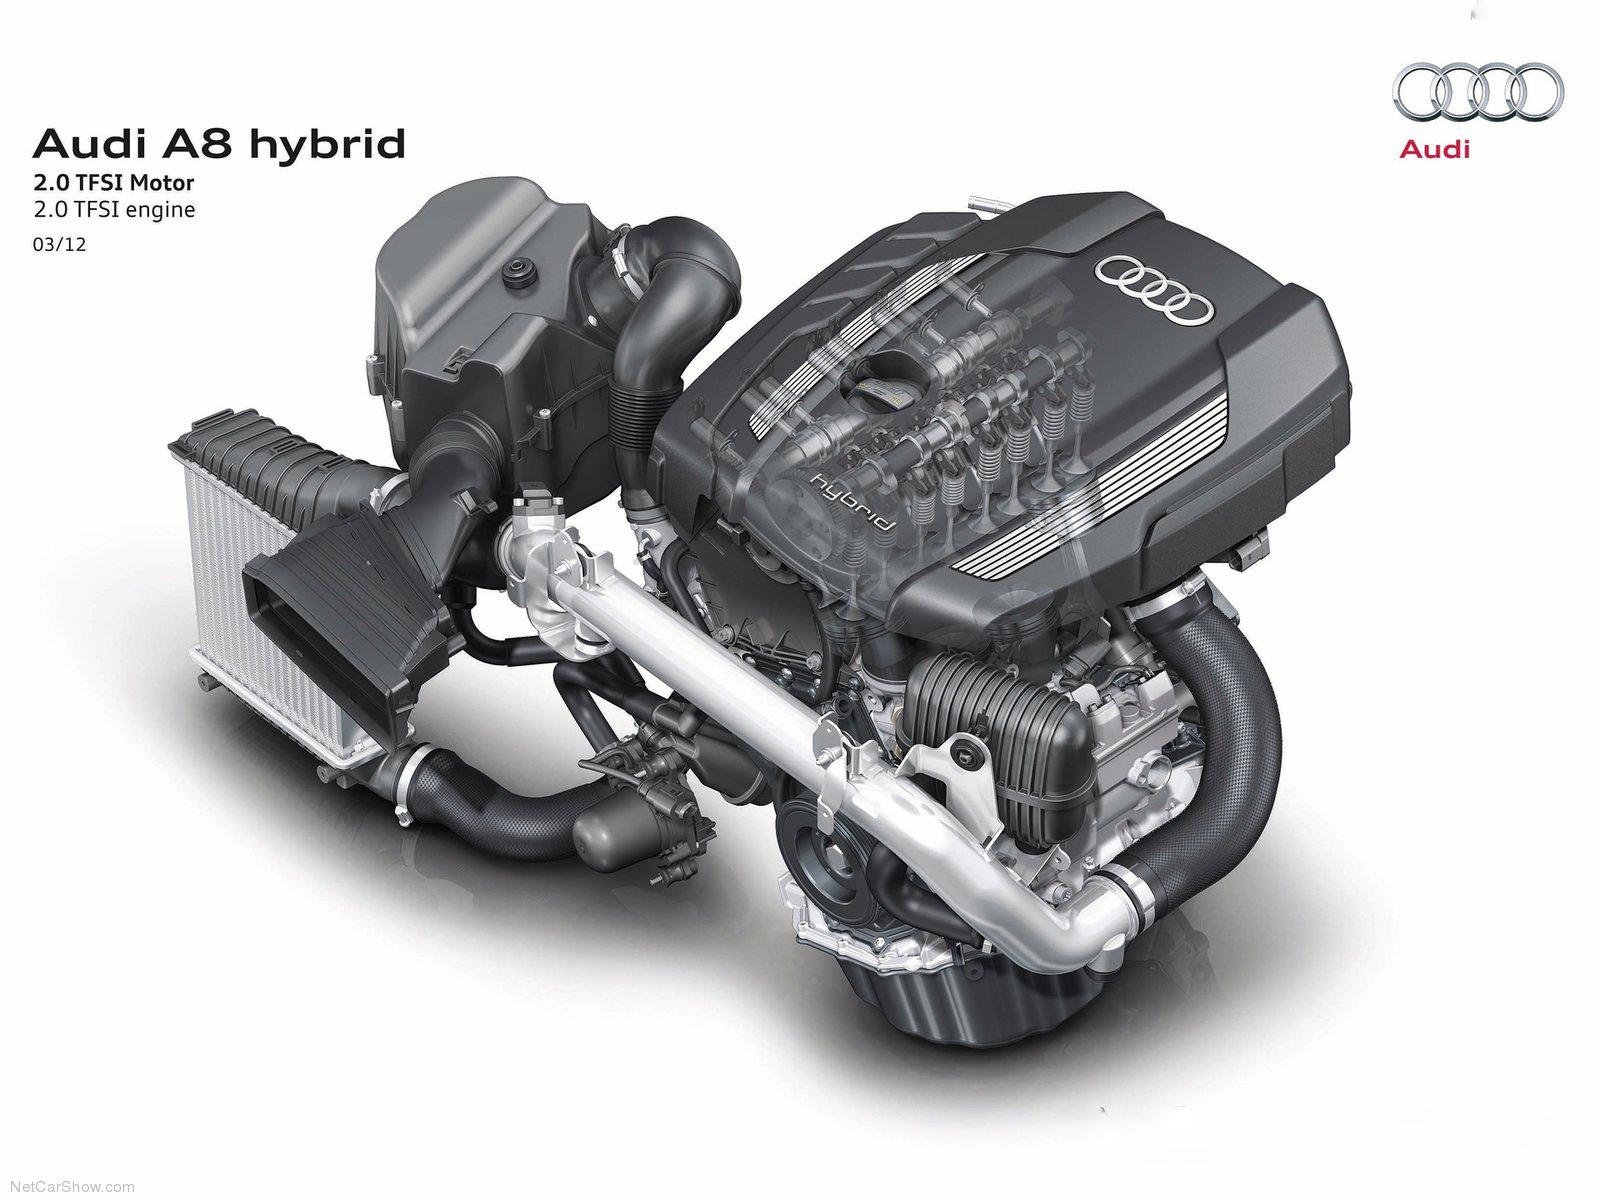 Audi 2 0 Fsi Engine Diagram Free Download Wiring Diagrams VW 1.8 Engine  Diagram Audi 2 0 Tfsi Engine Diagram